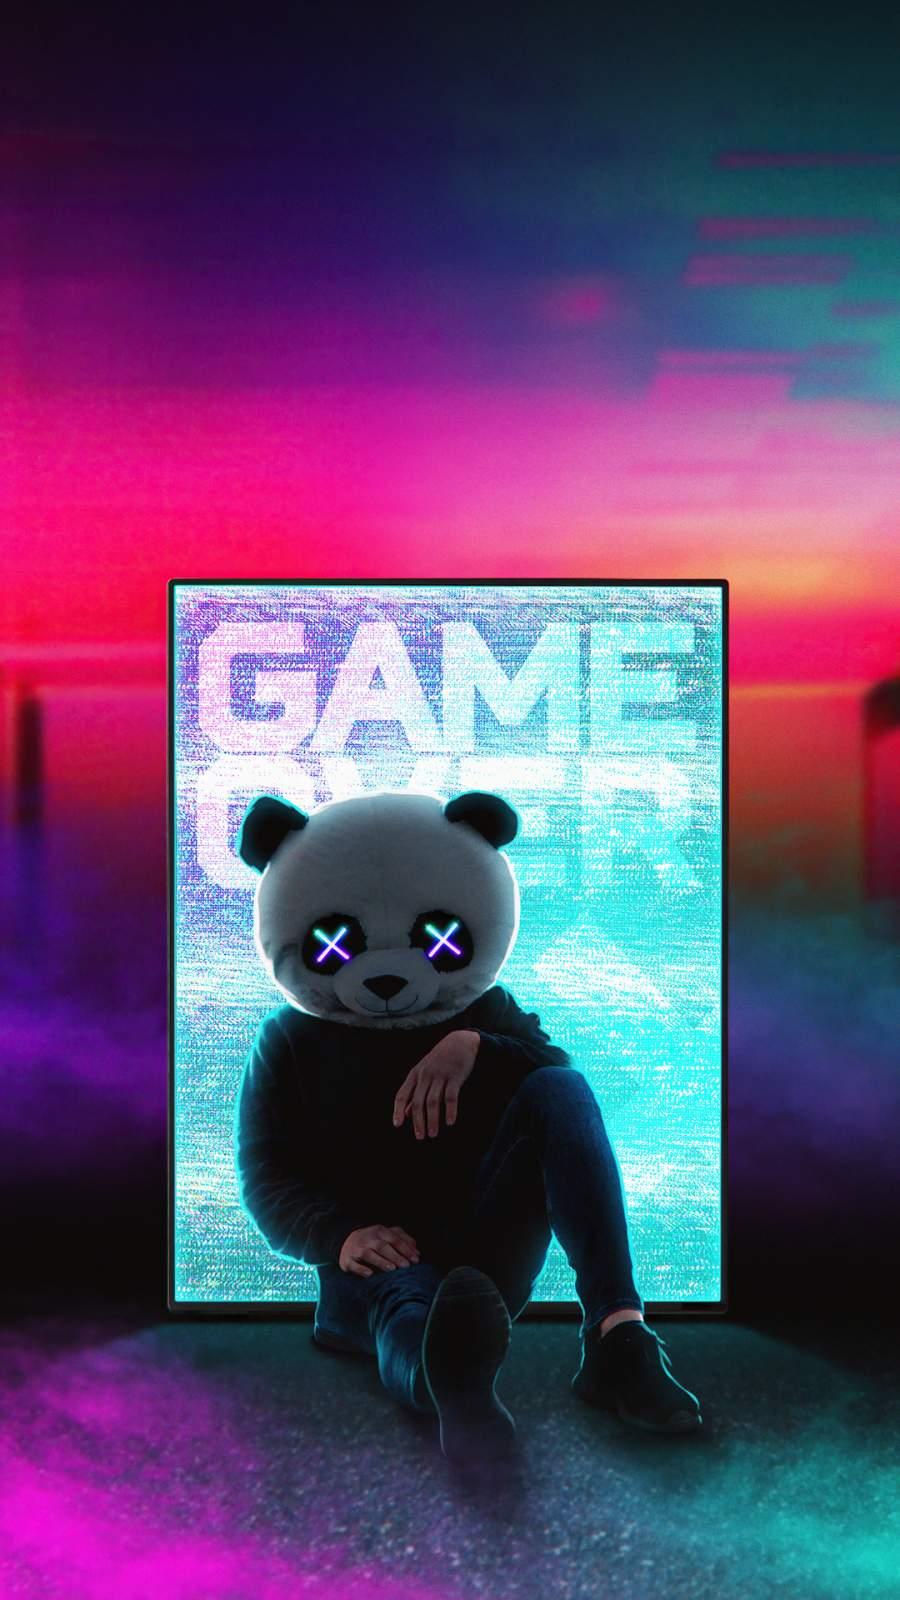 Game Over Panda